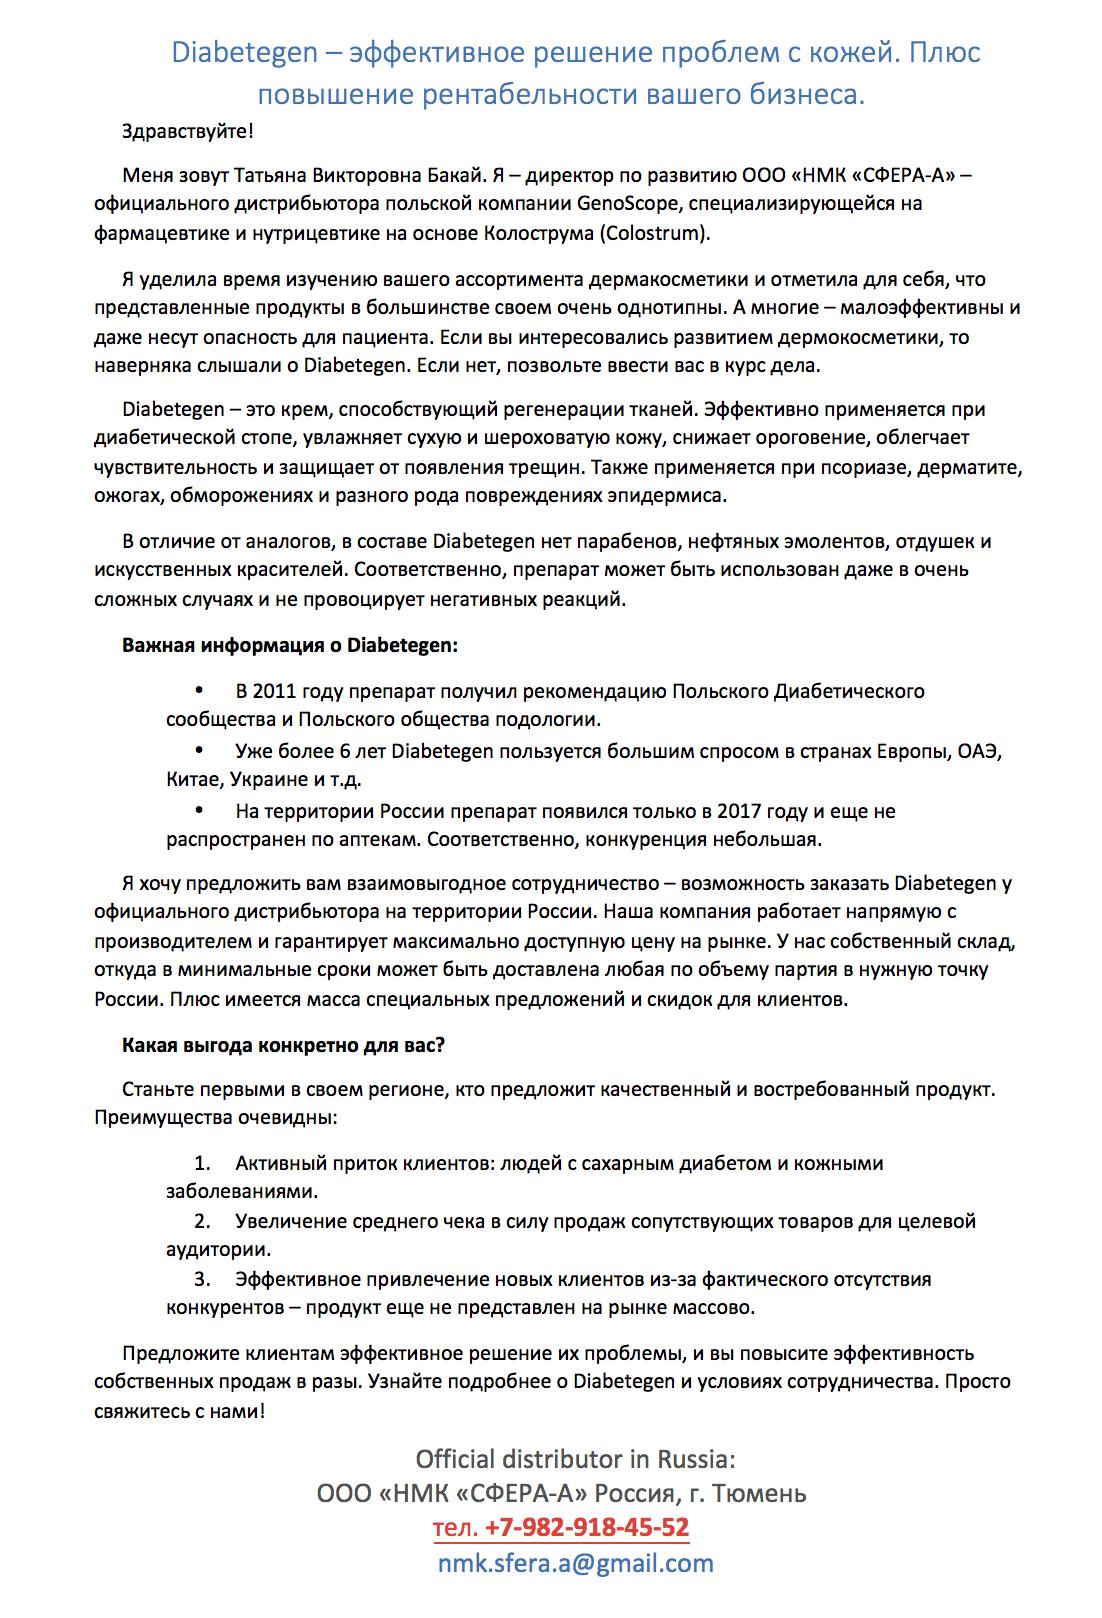 Картинка primer kommercheskogo predlozheniya № 38 kommercheskoe predlozhenie dlya diabetegen - Пример коммерческого предложения № 38 - Коммерческое предложение для Diabetegen.